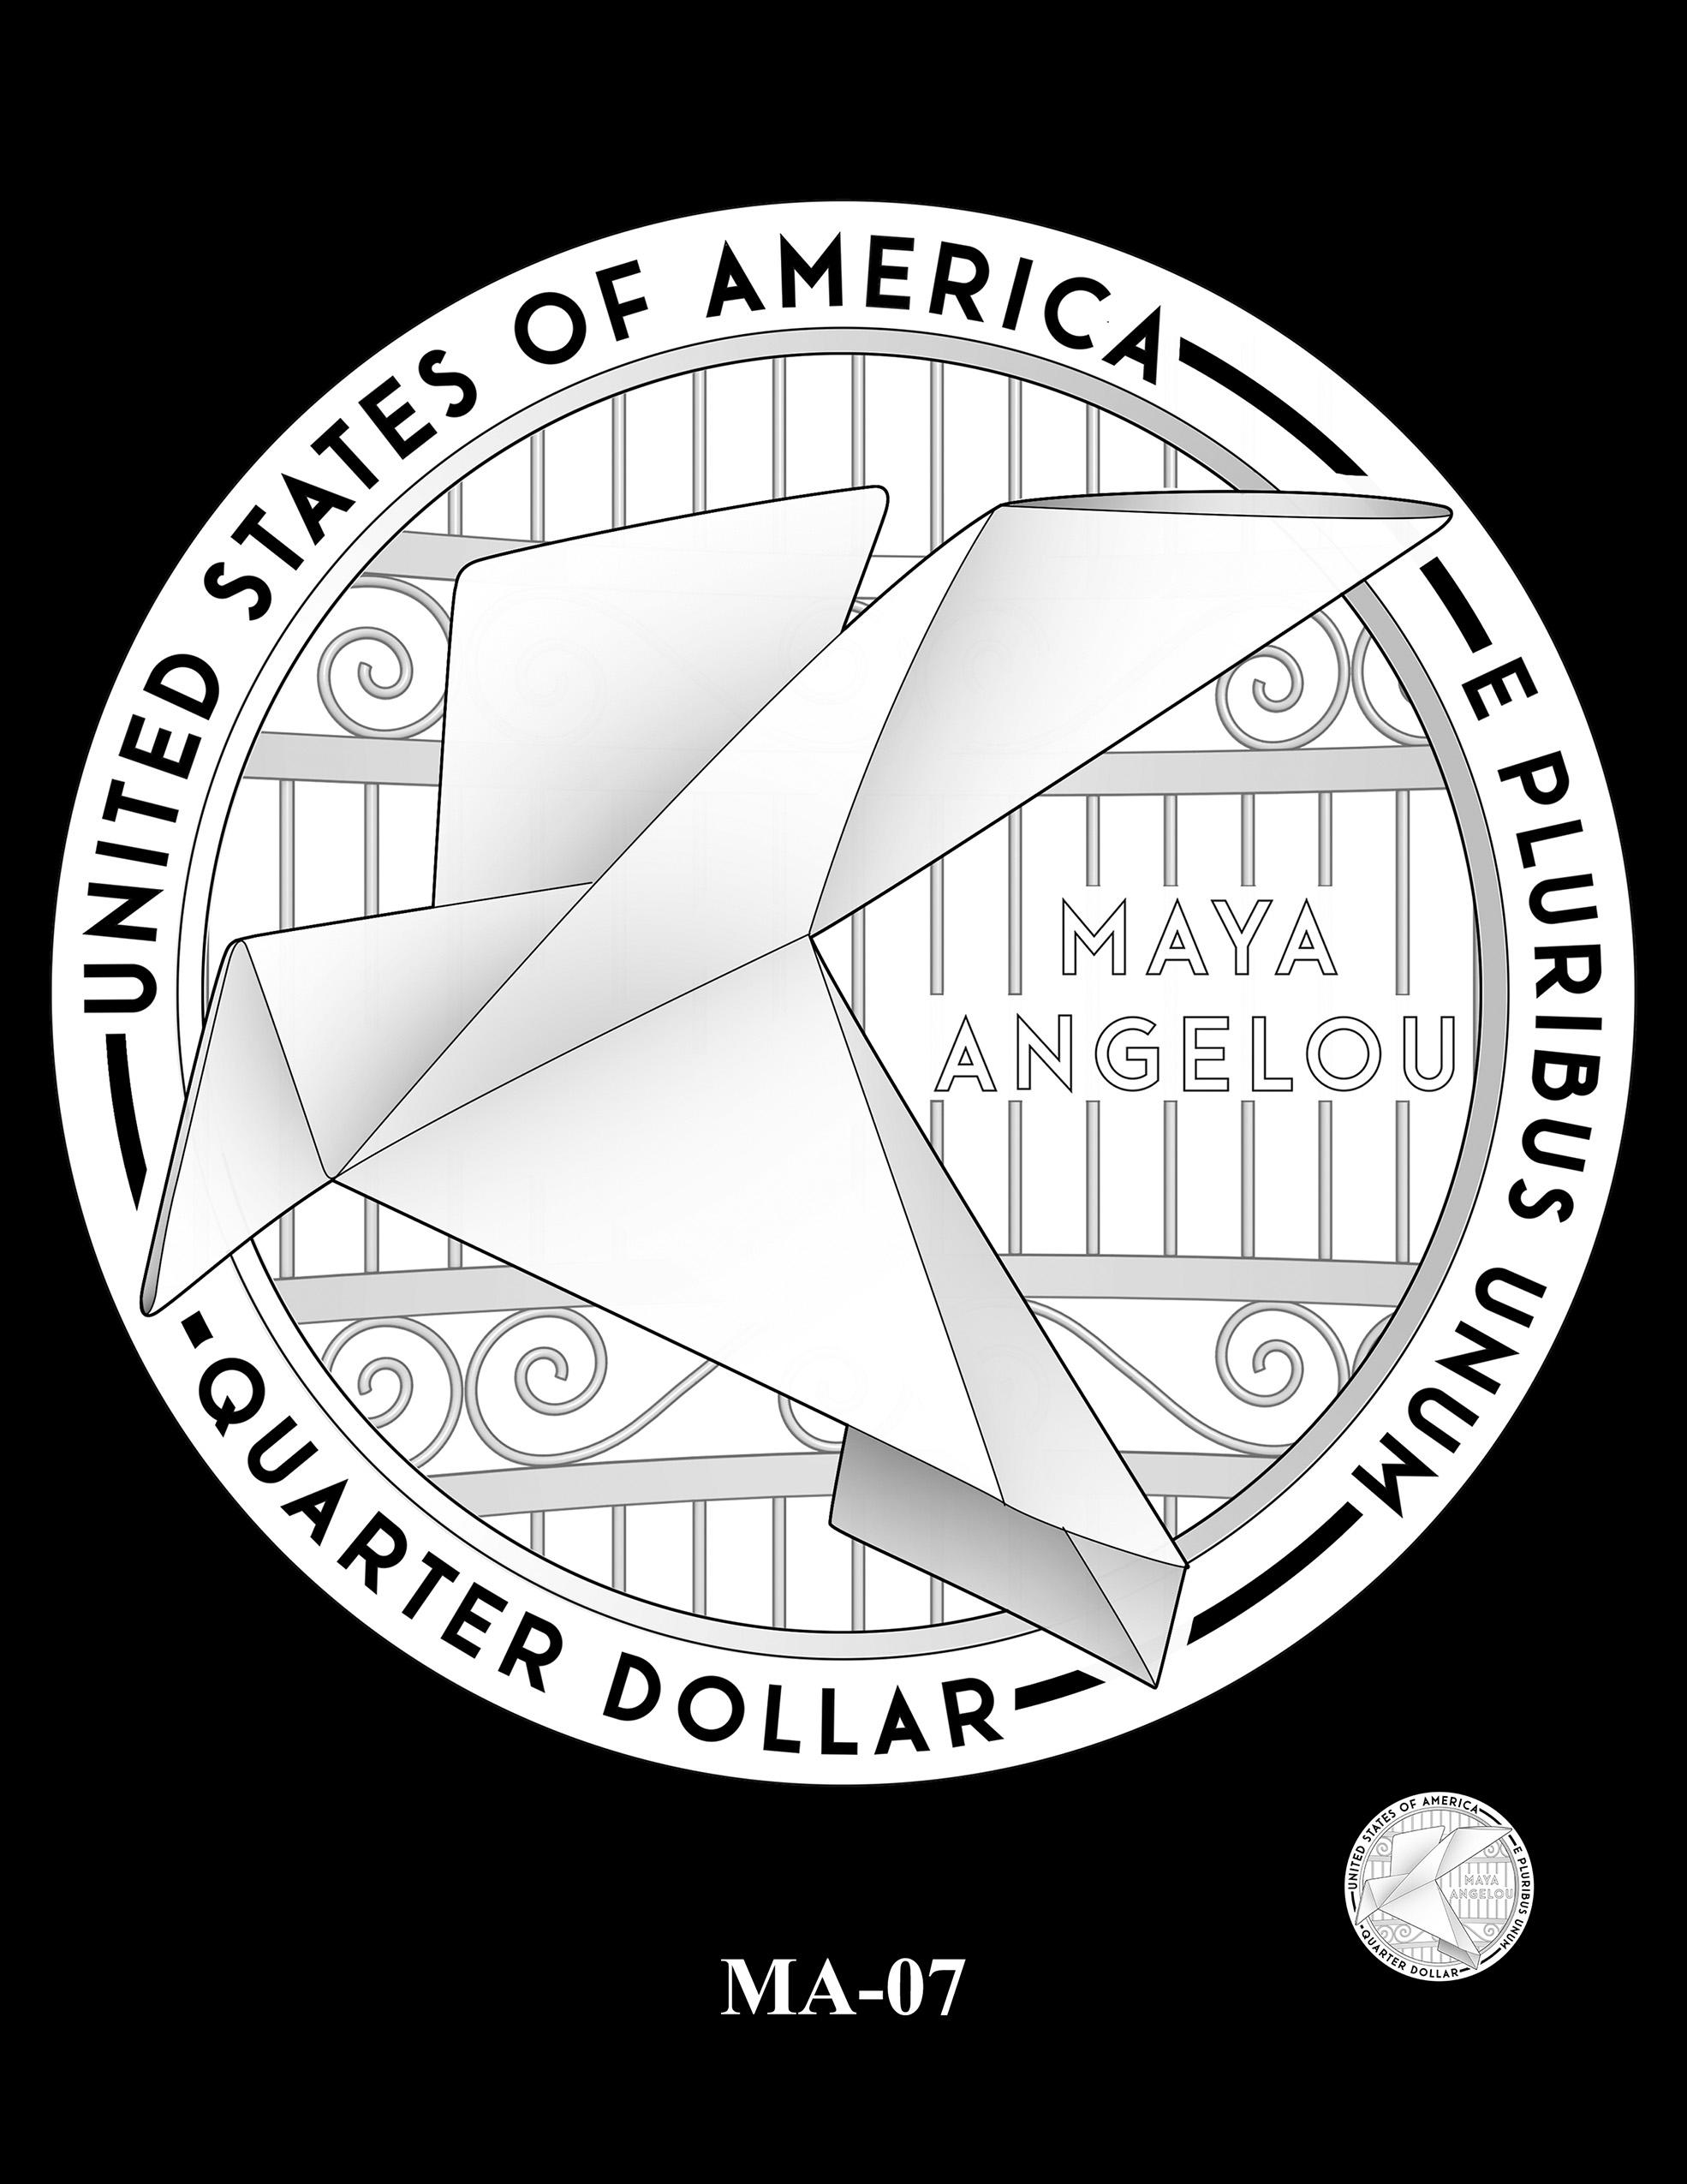 MA-07 -- 2022 American Women Quarters - Maya Angelou Reverse